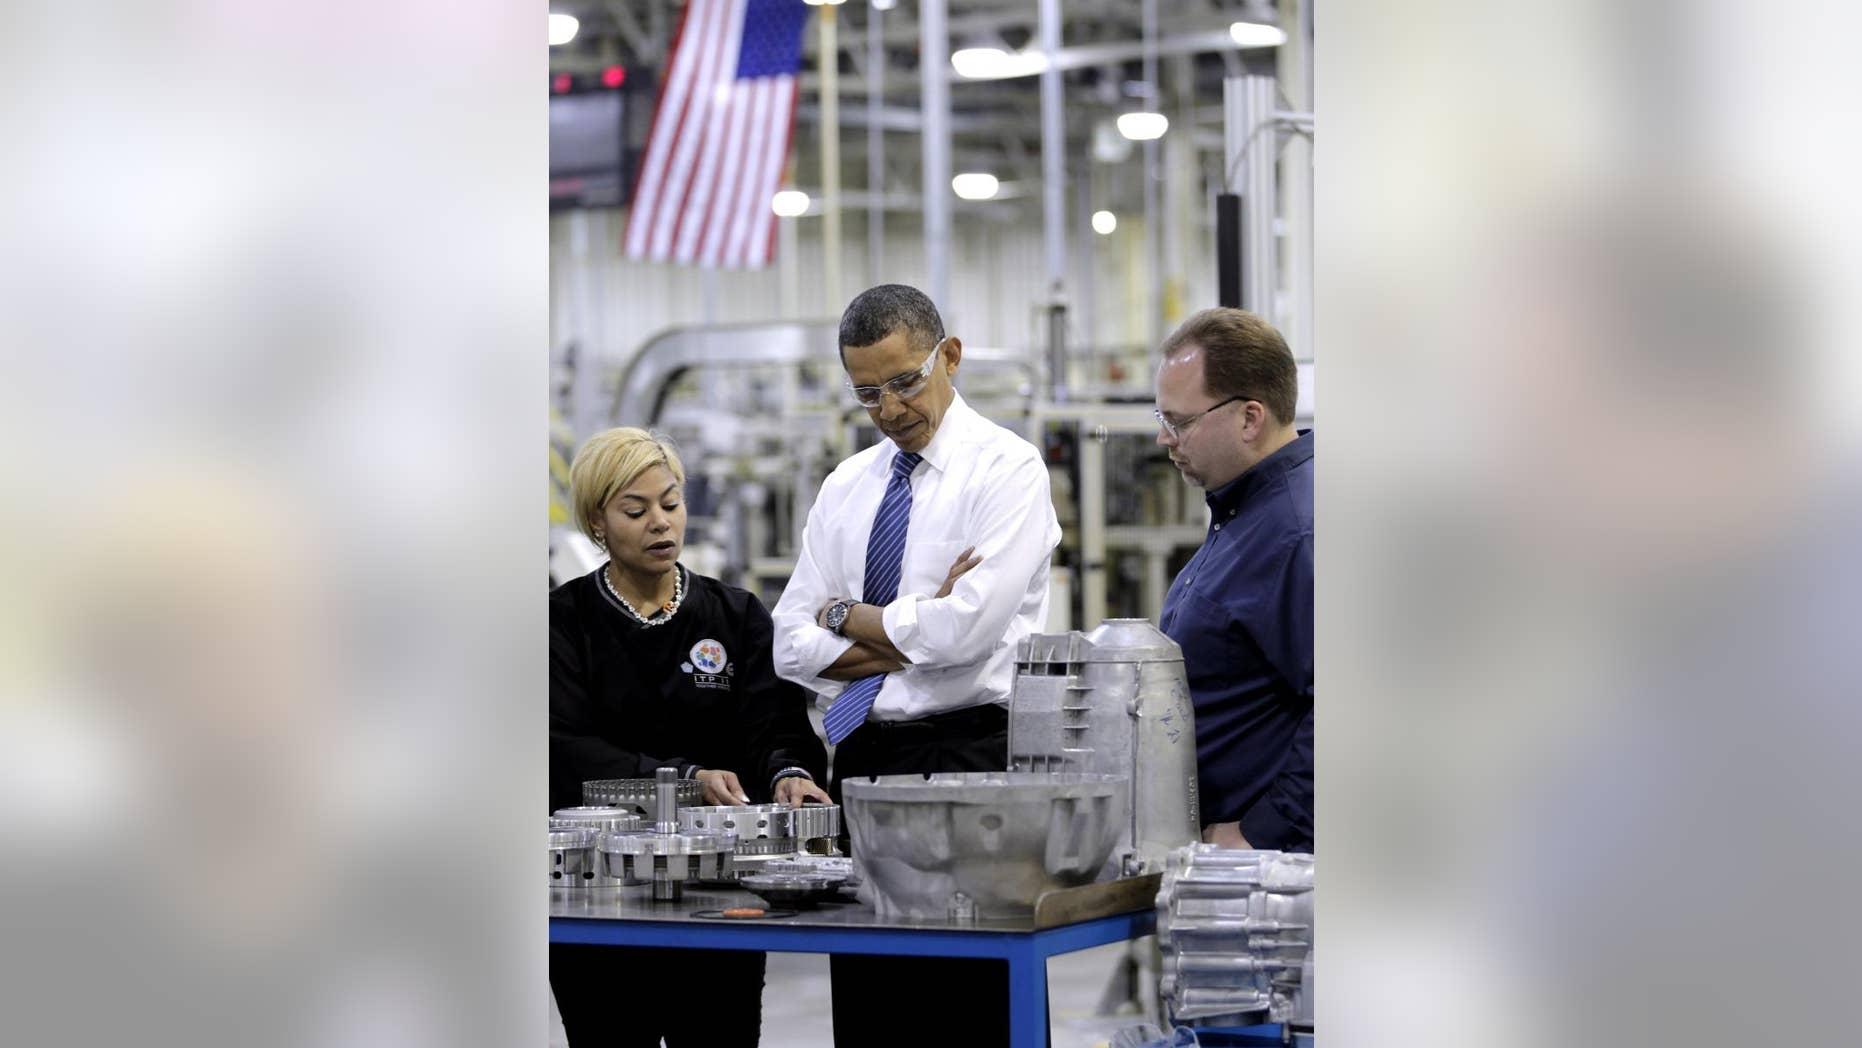 President Barack Obama tours Chrysler's Indiana Transmission Plant II in Kokomo, Ind., Tuesday, Nov. 23, 2010. (AP Photo/J. Scott Applewhite)